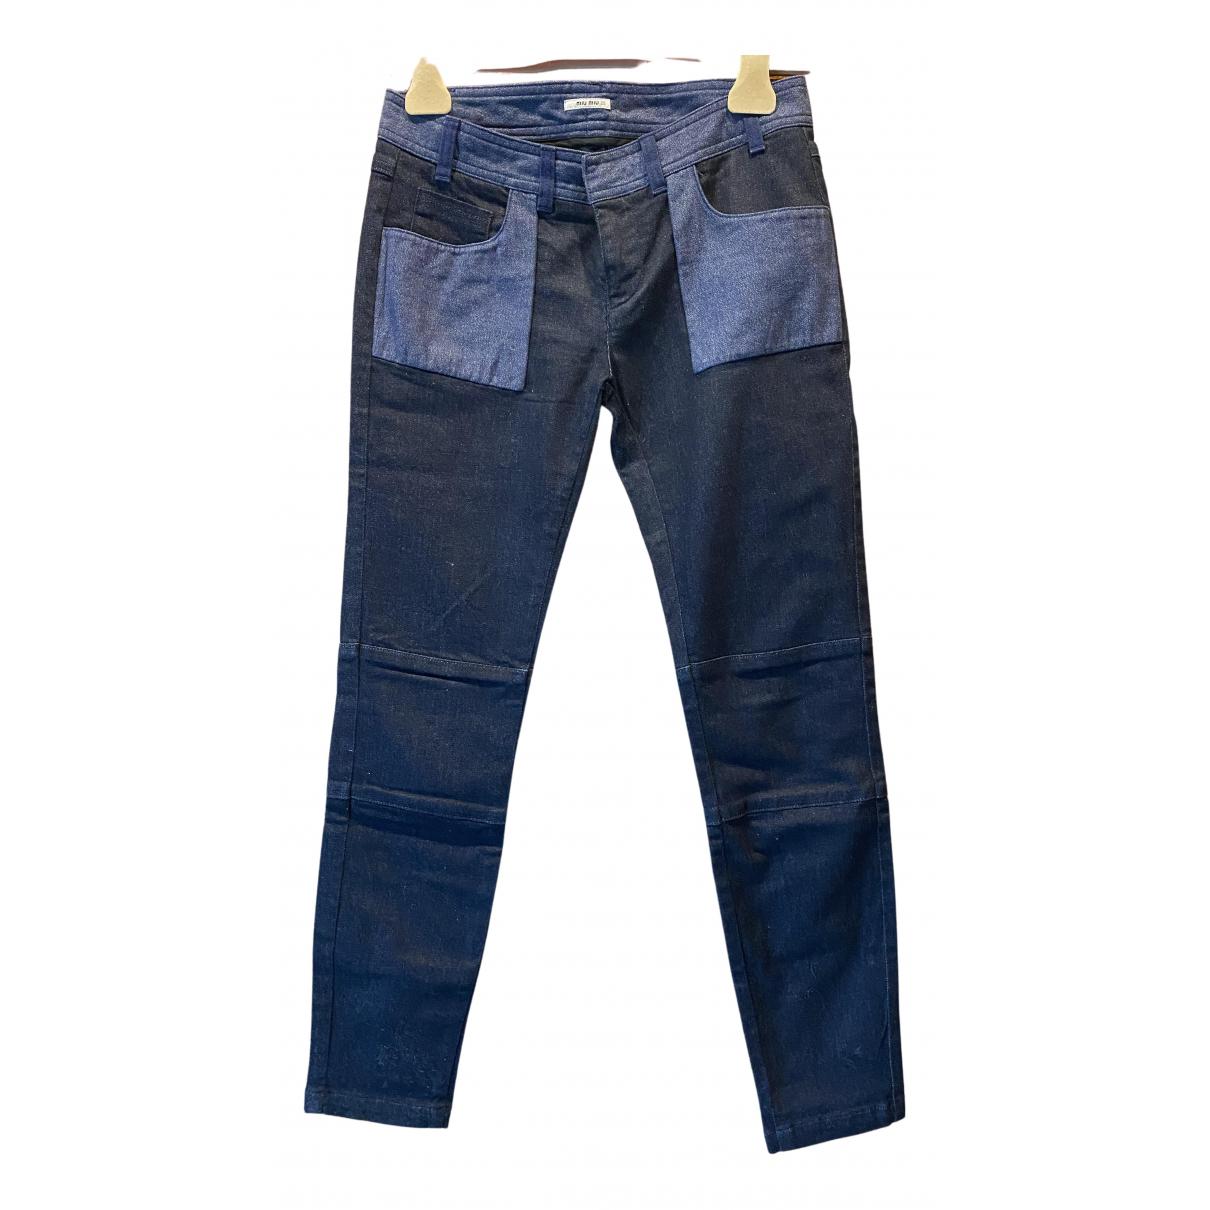 Miu Miu N Multicolour Denim - Jeans Jeans for Women 25 US